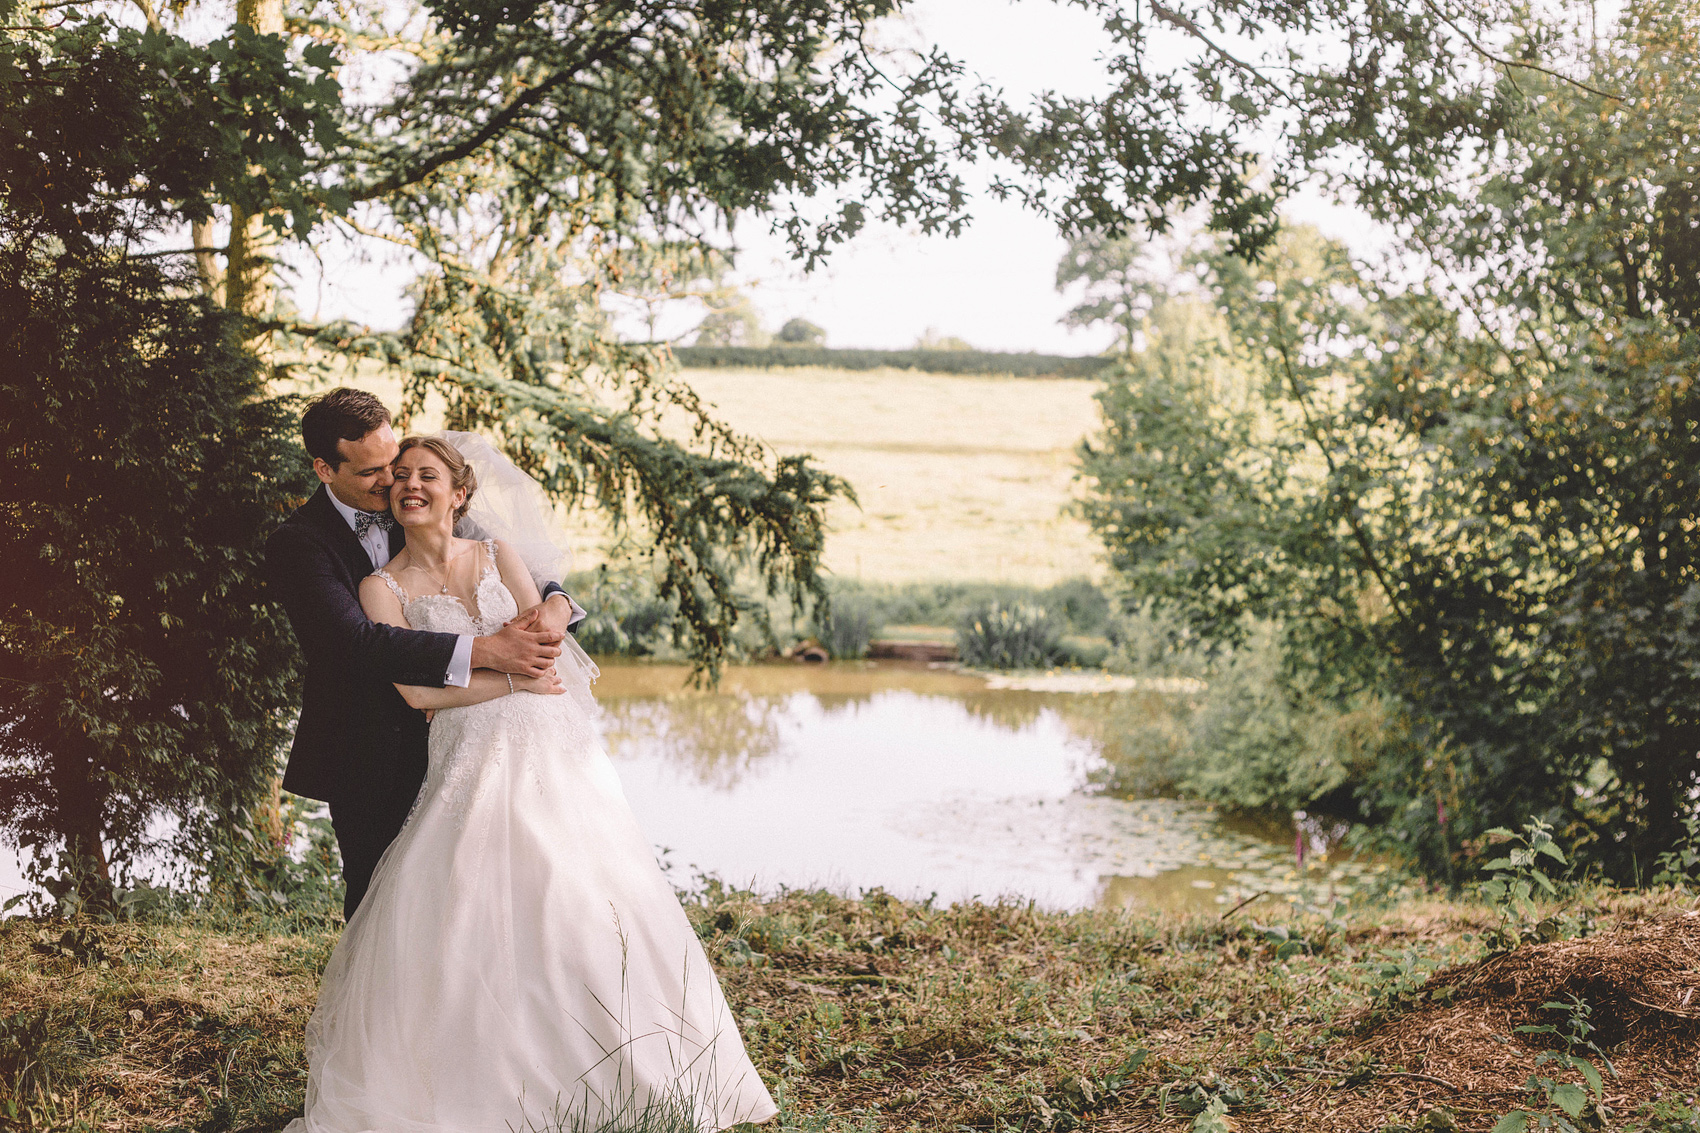 Dilhorne_Village_Hall_Wedding_Photography_-_85_.jpg